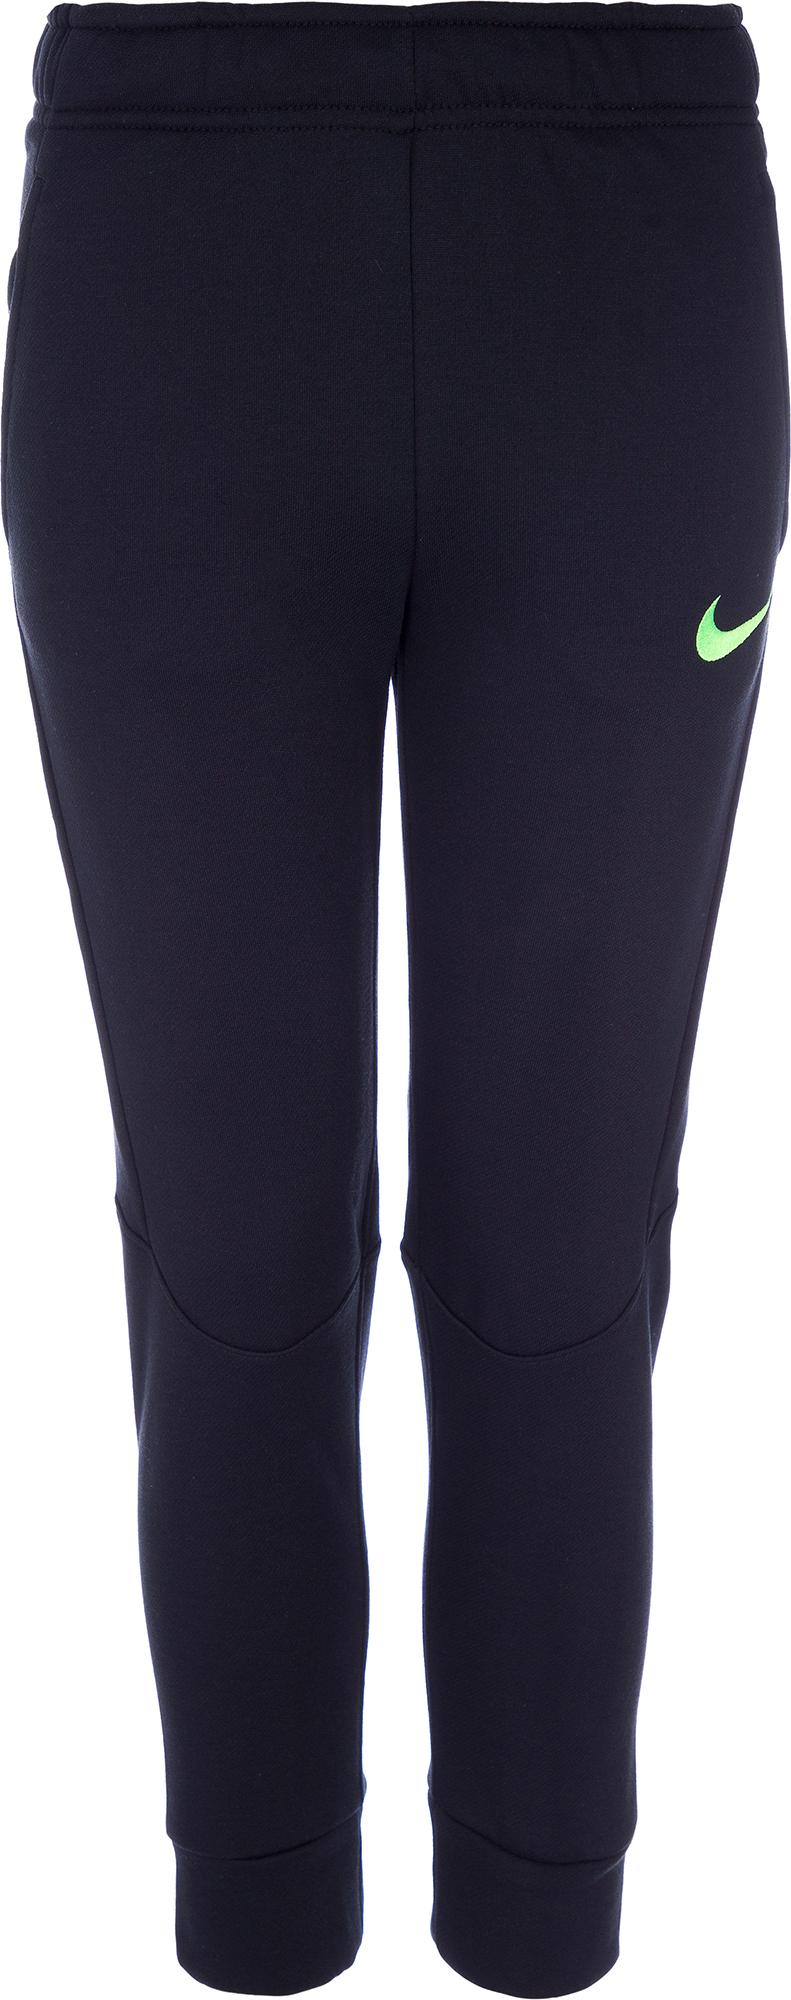 Nike Брюки для мальчиков Nike Dry, размер 158-170 брюки женские oodji ultra цвет темно серый меланж 11700214 1b 14917 2500m размер 38 170 44 170